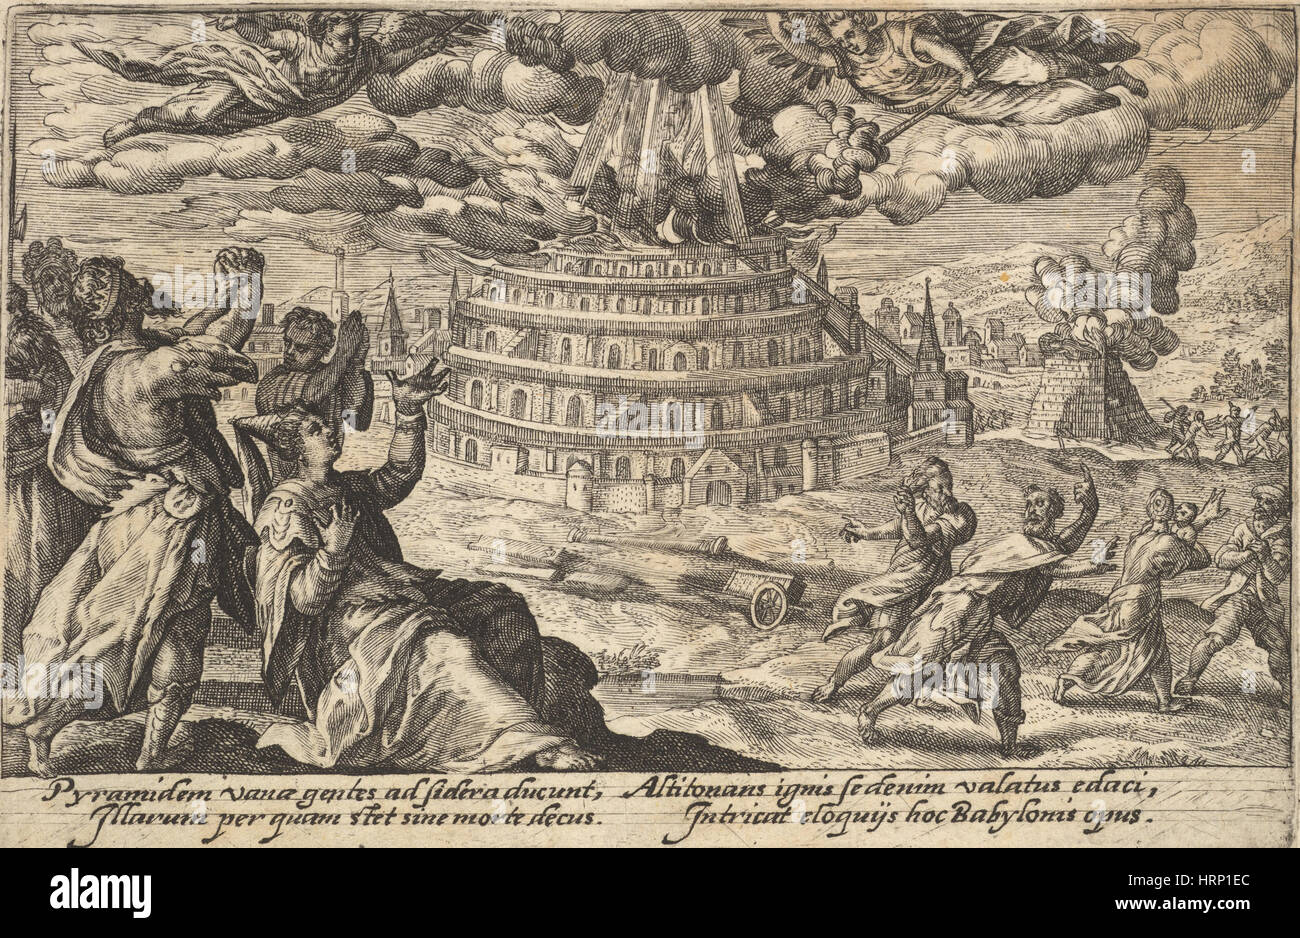 Tower of Babel Destroyed, Genesis Scene - Stock Image